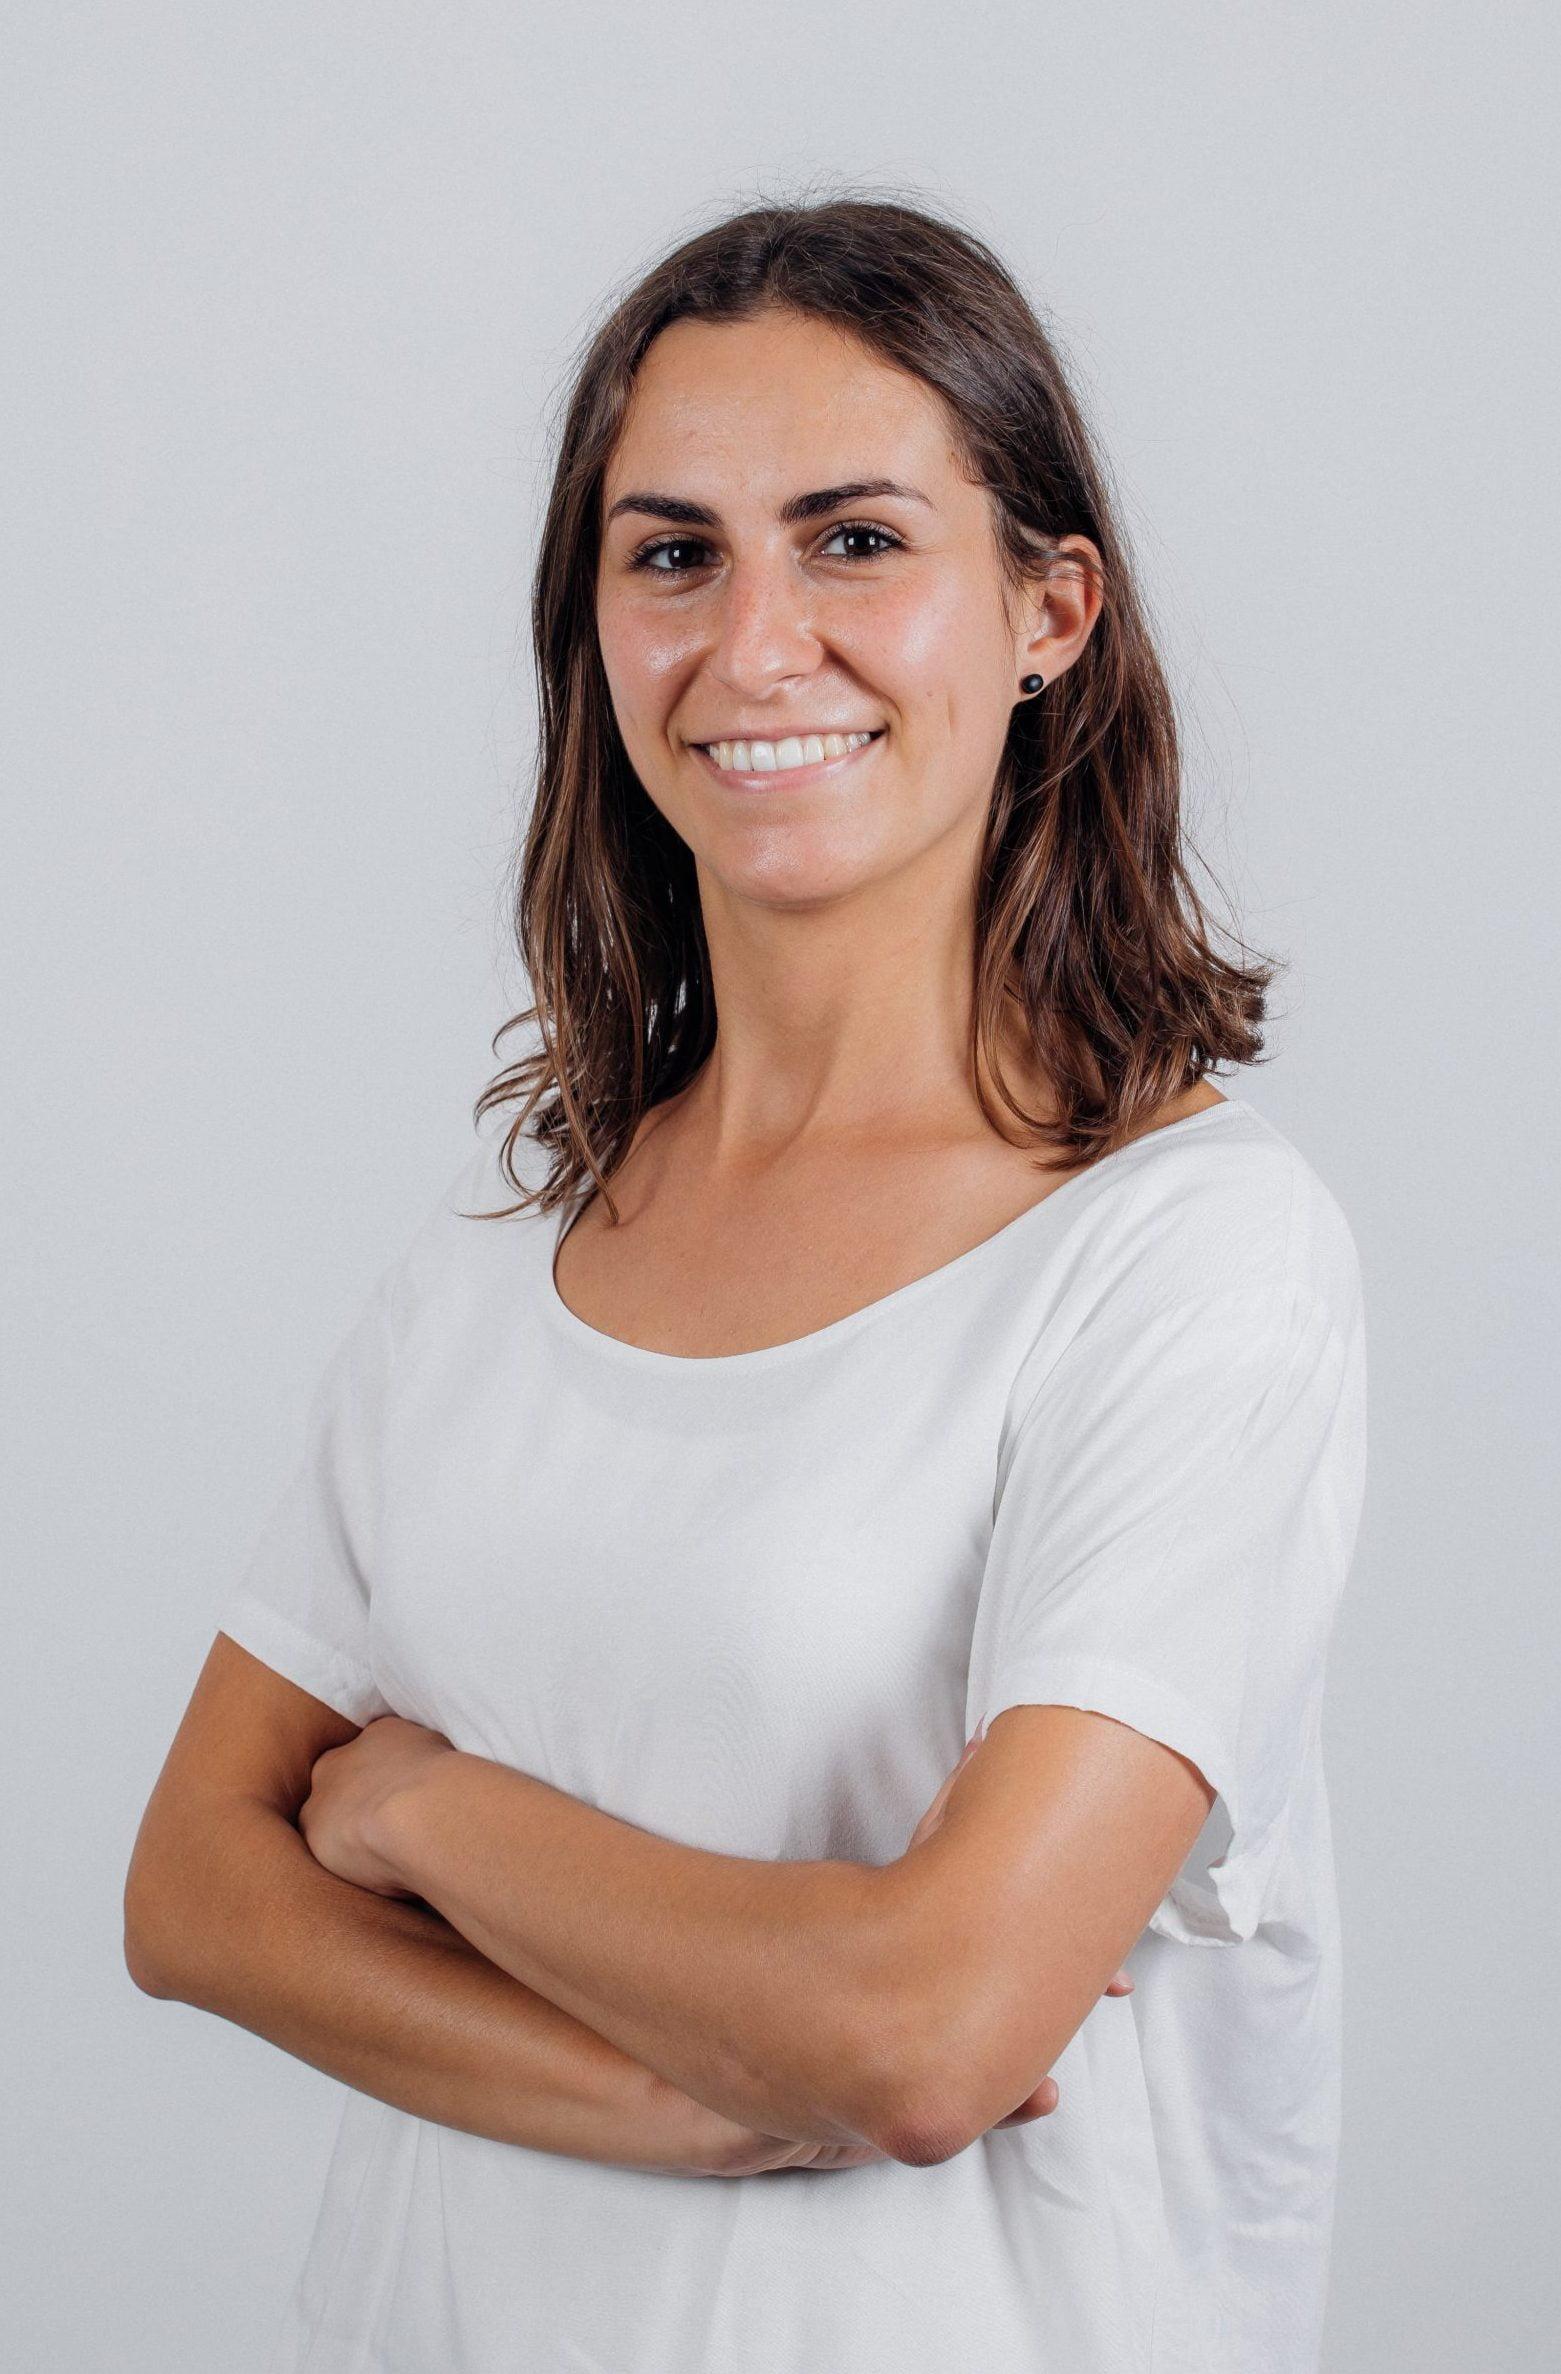 Valentina Marchetti - etc engineering solutions progettazione controllo processi efficientamento impiantii acque reflue trento ingegneria